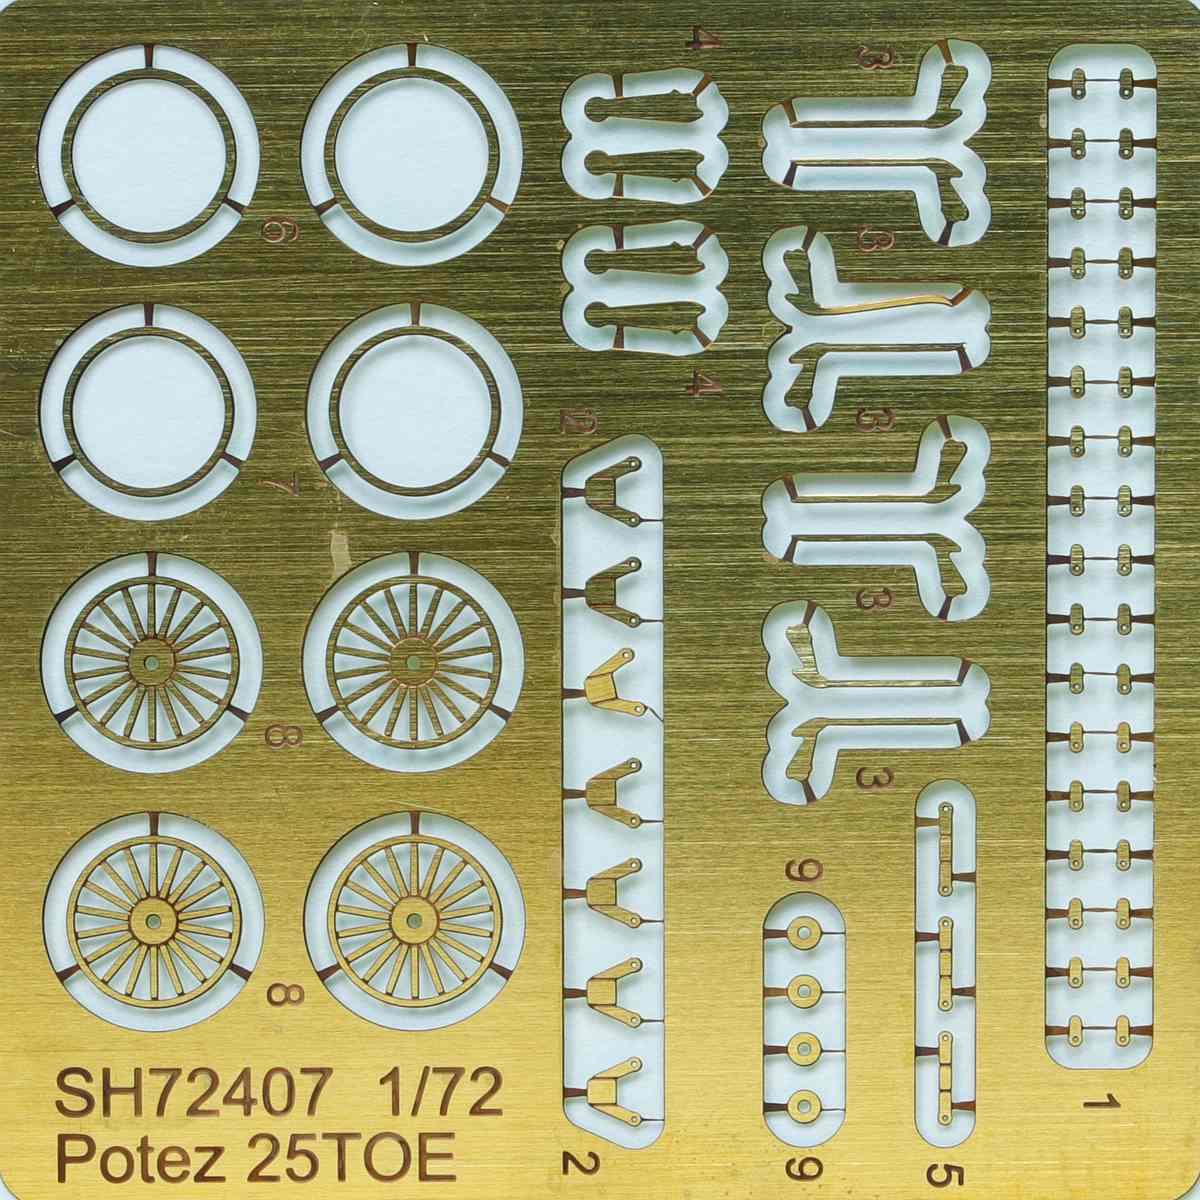 Special-Hobby-SH-72407-Potez-25TOE-32 Potez 25 TOE in 1:72 von Special Hobby # 72407